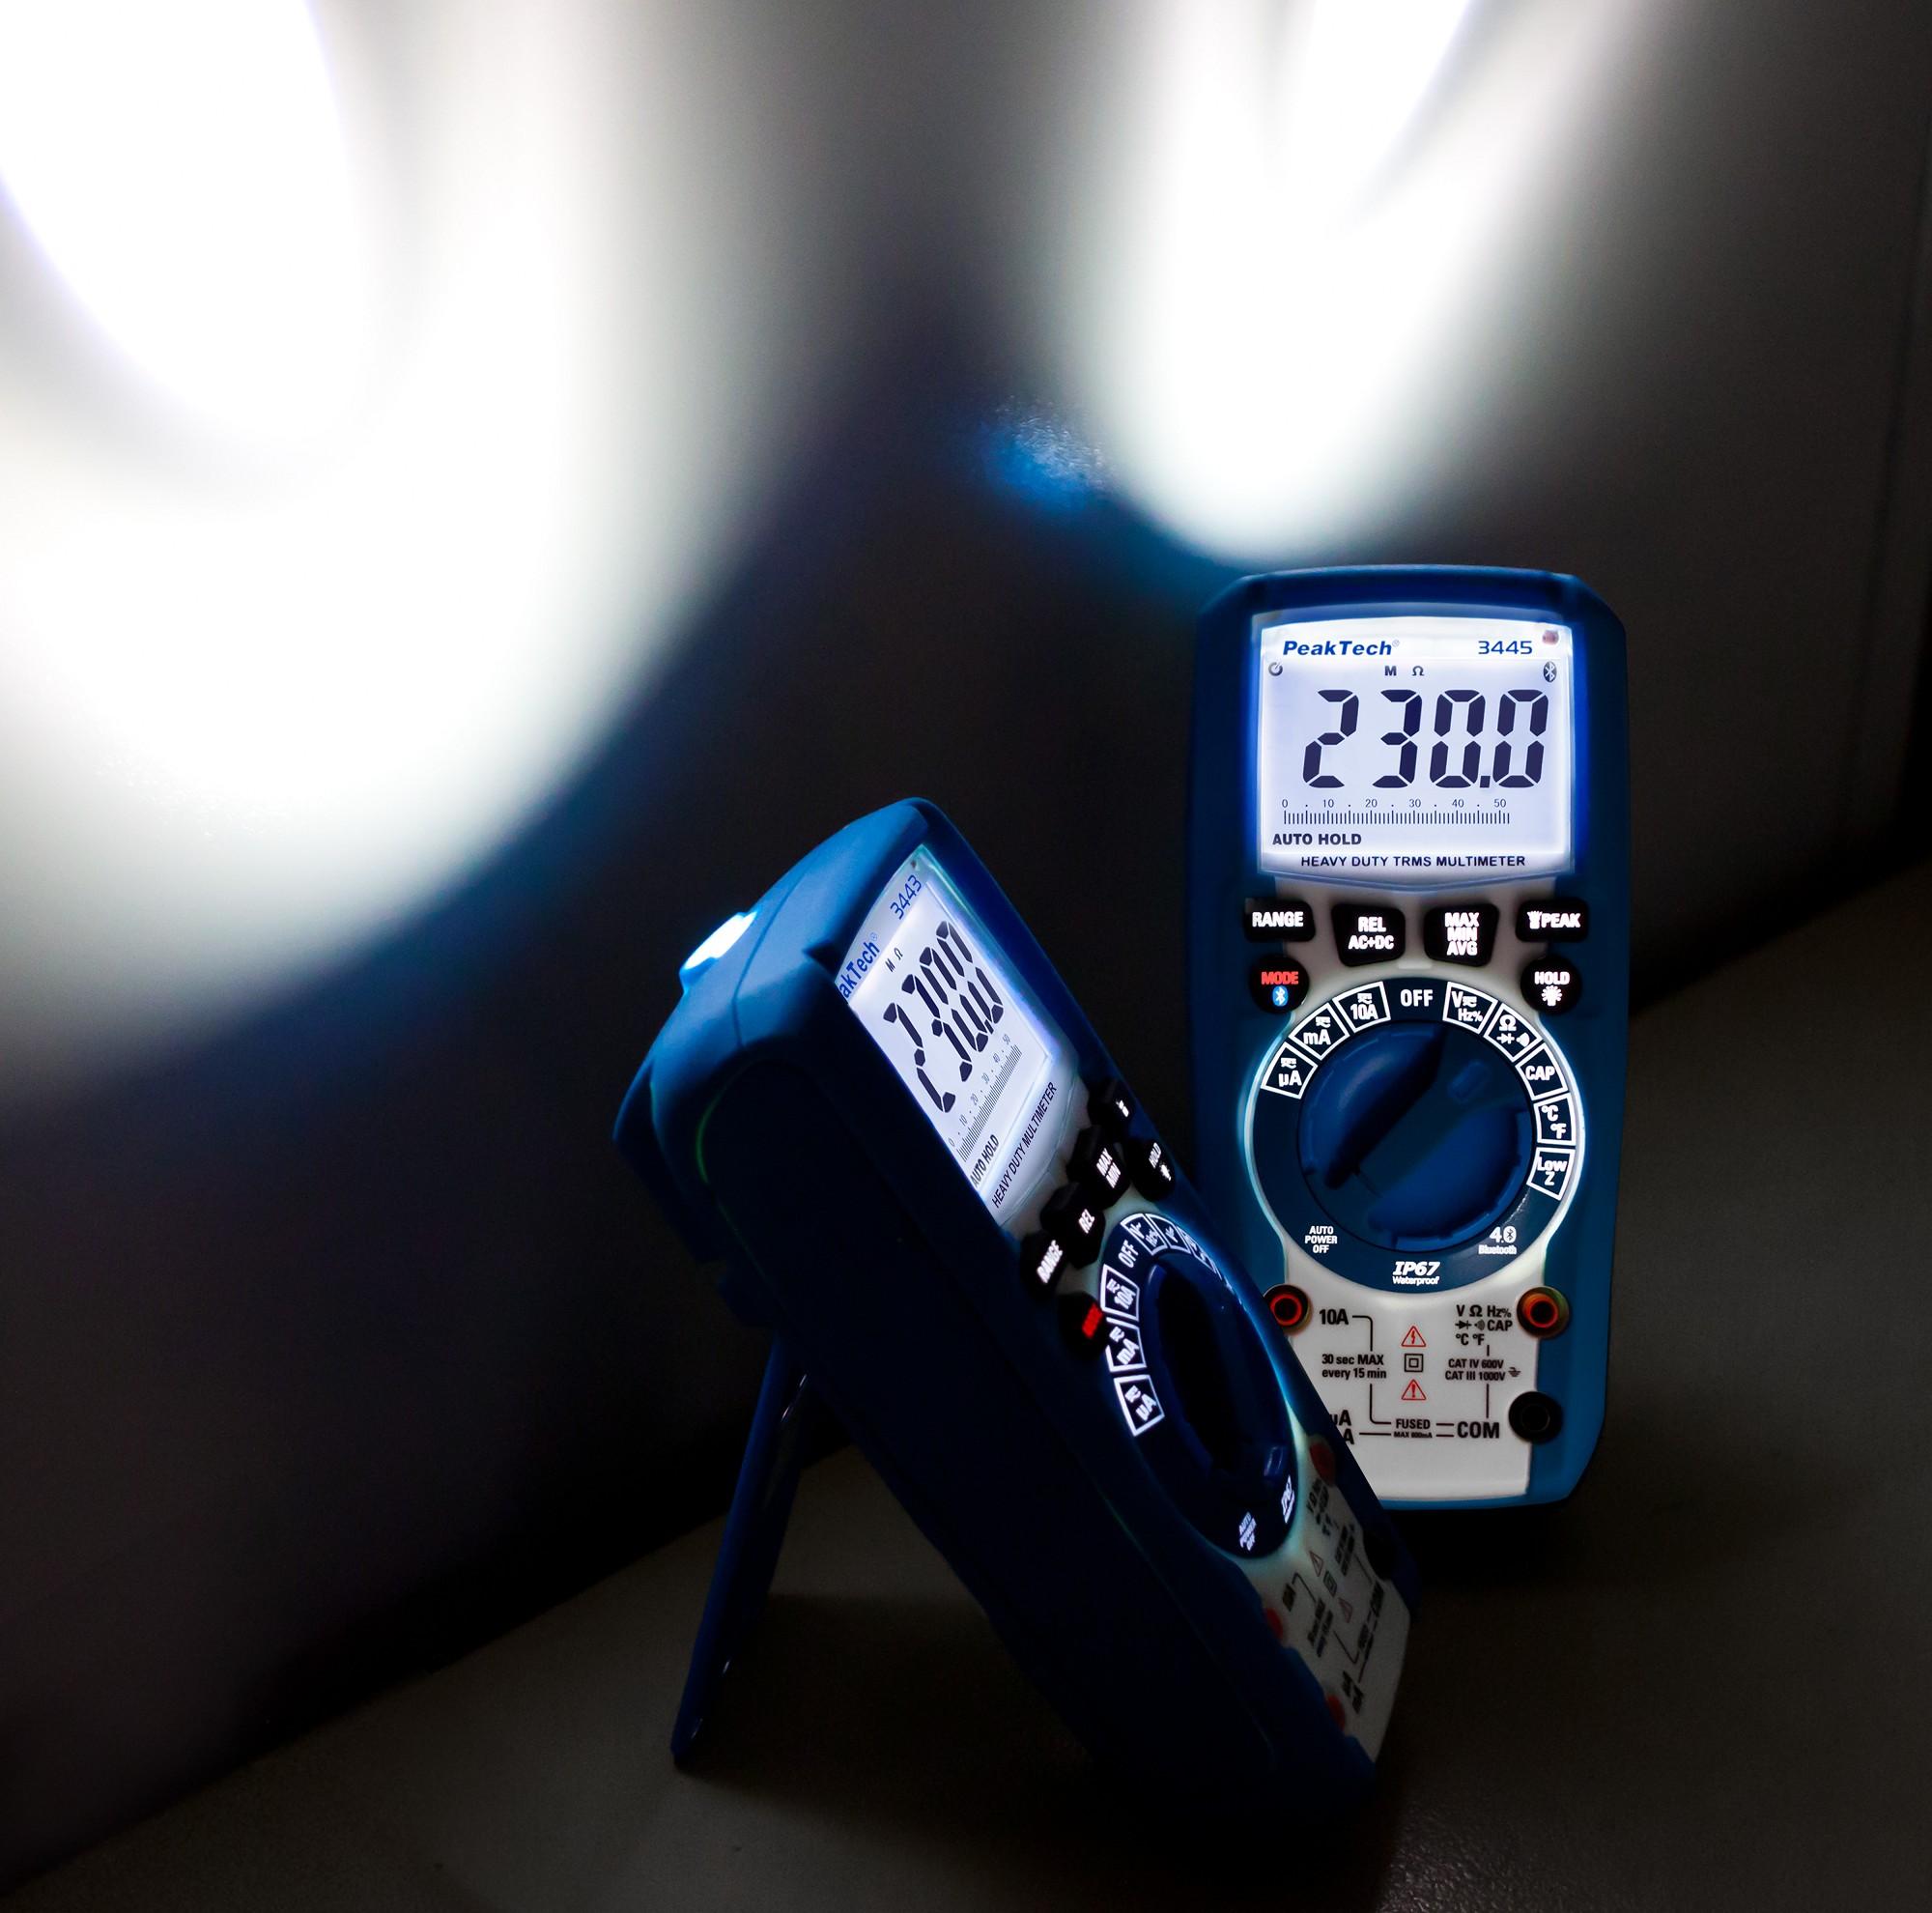 «PeakTech® P 3445» TrueRMS digital multimeter 6,000 counts, IP67, BT